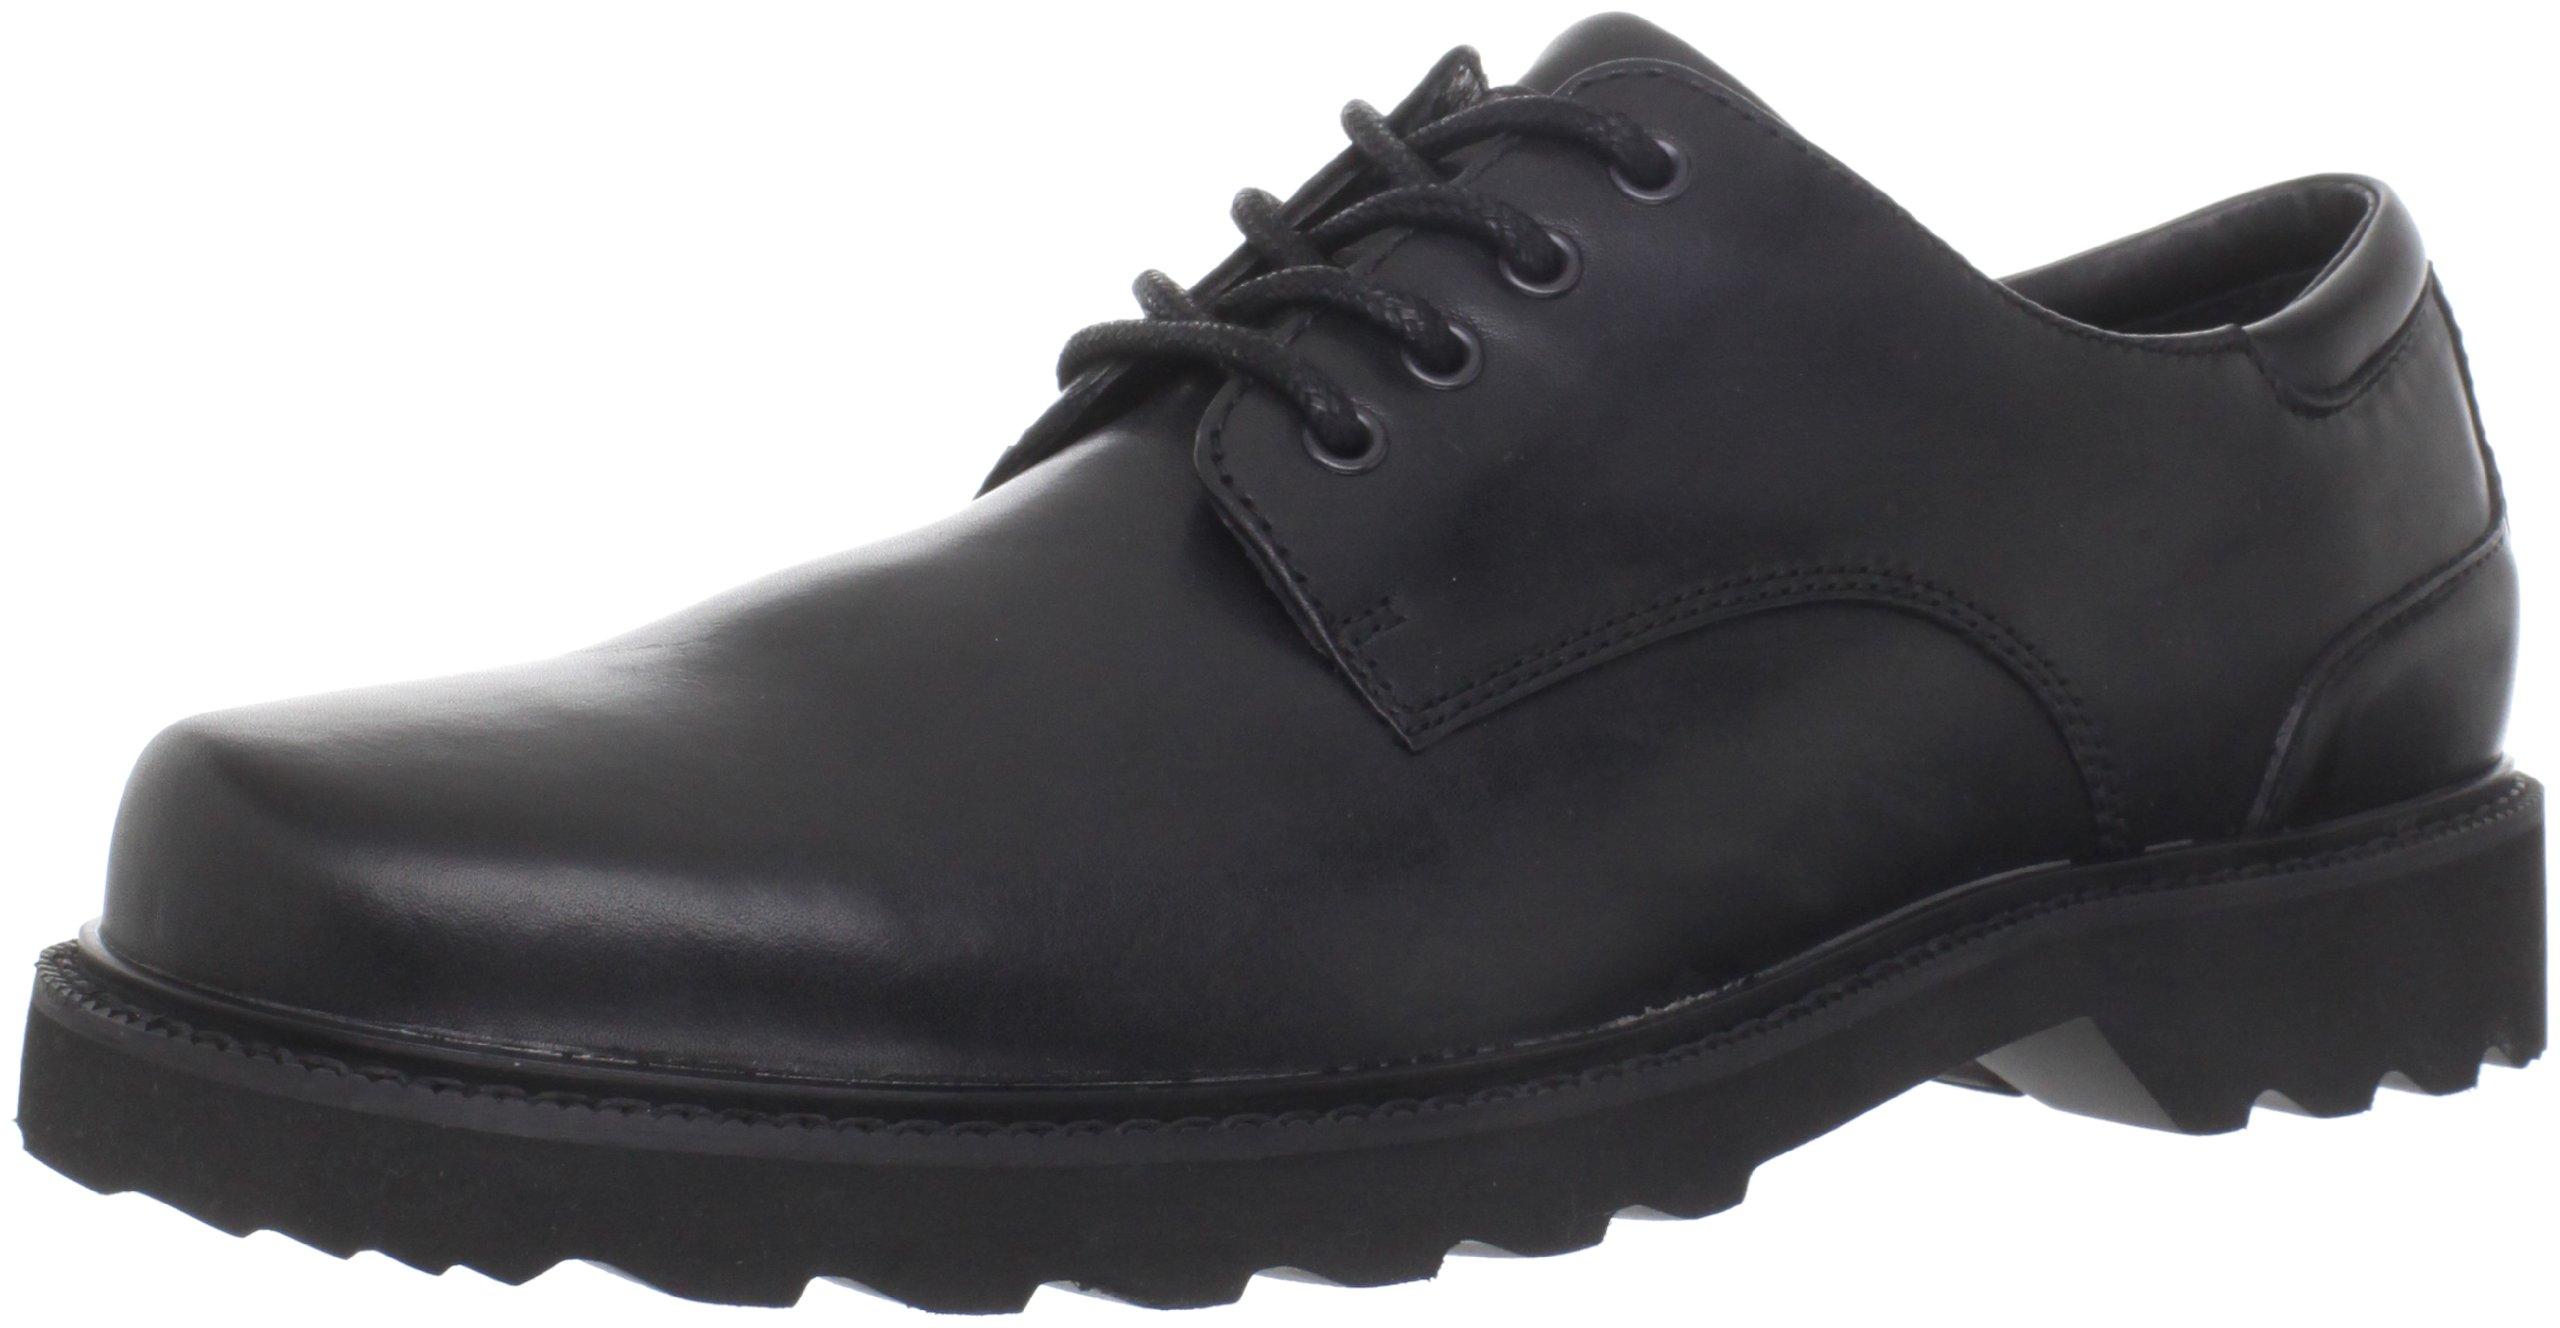 Rockport Men's Northfield Oxford-Black-13 M